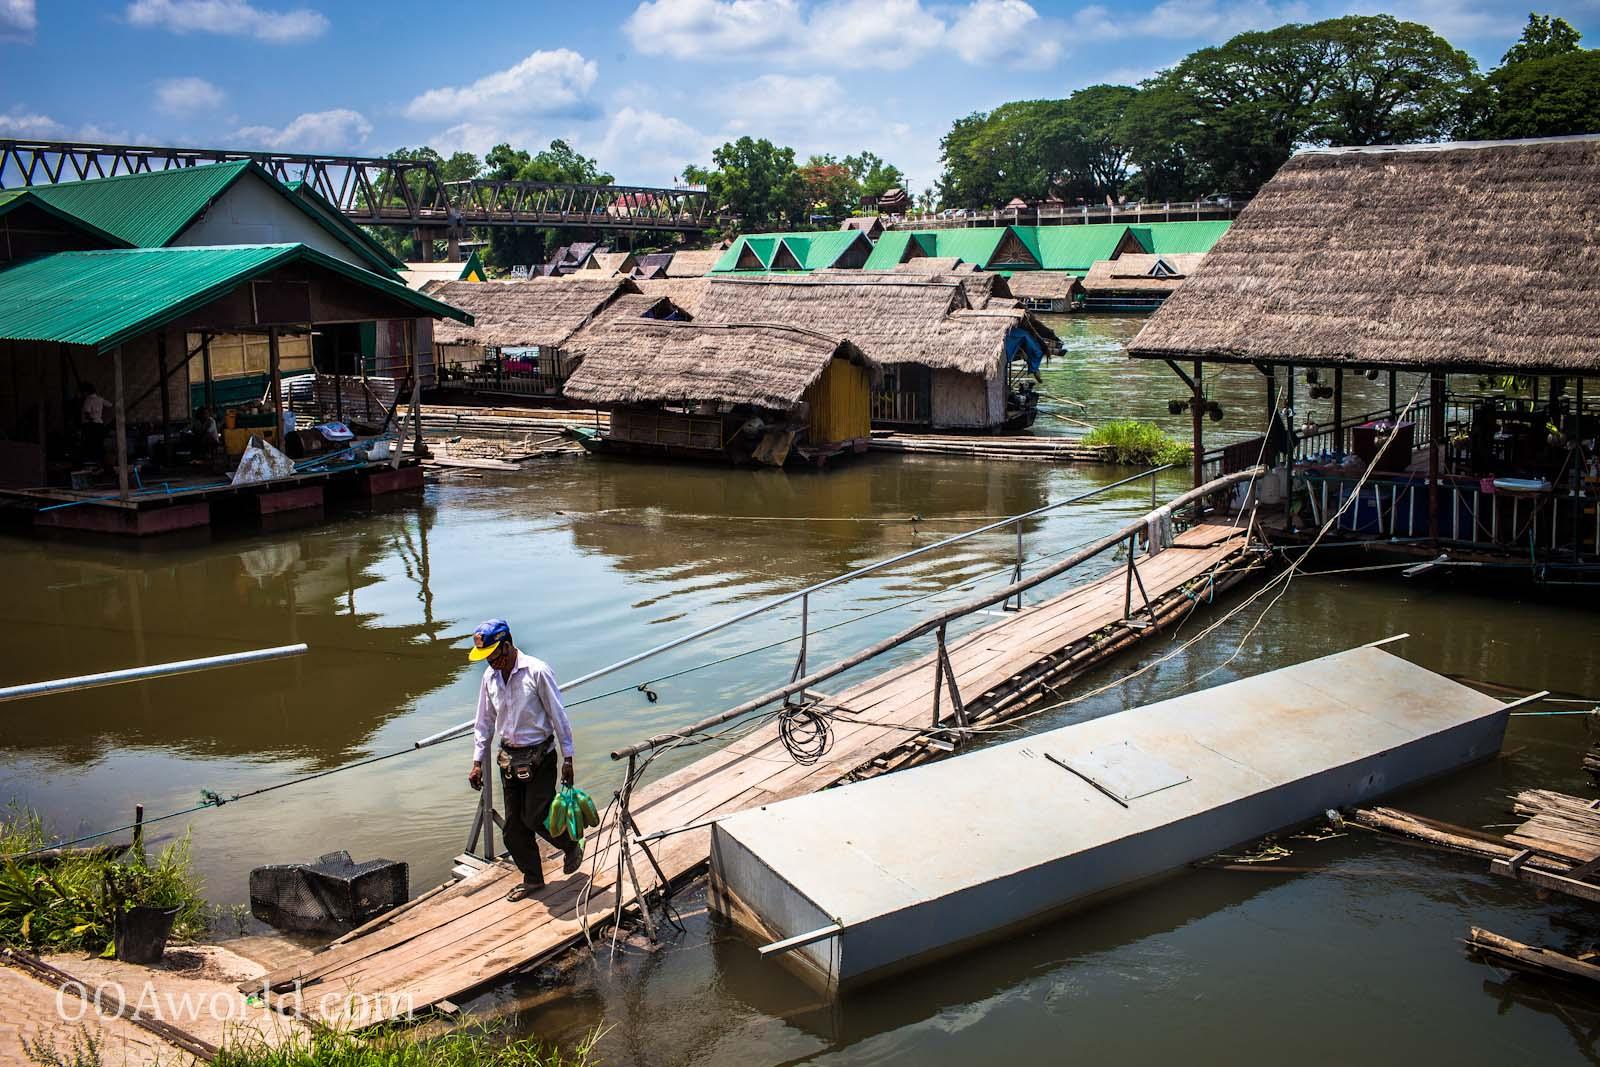 Mekong River Restaurant Photo Ooaworld